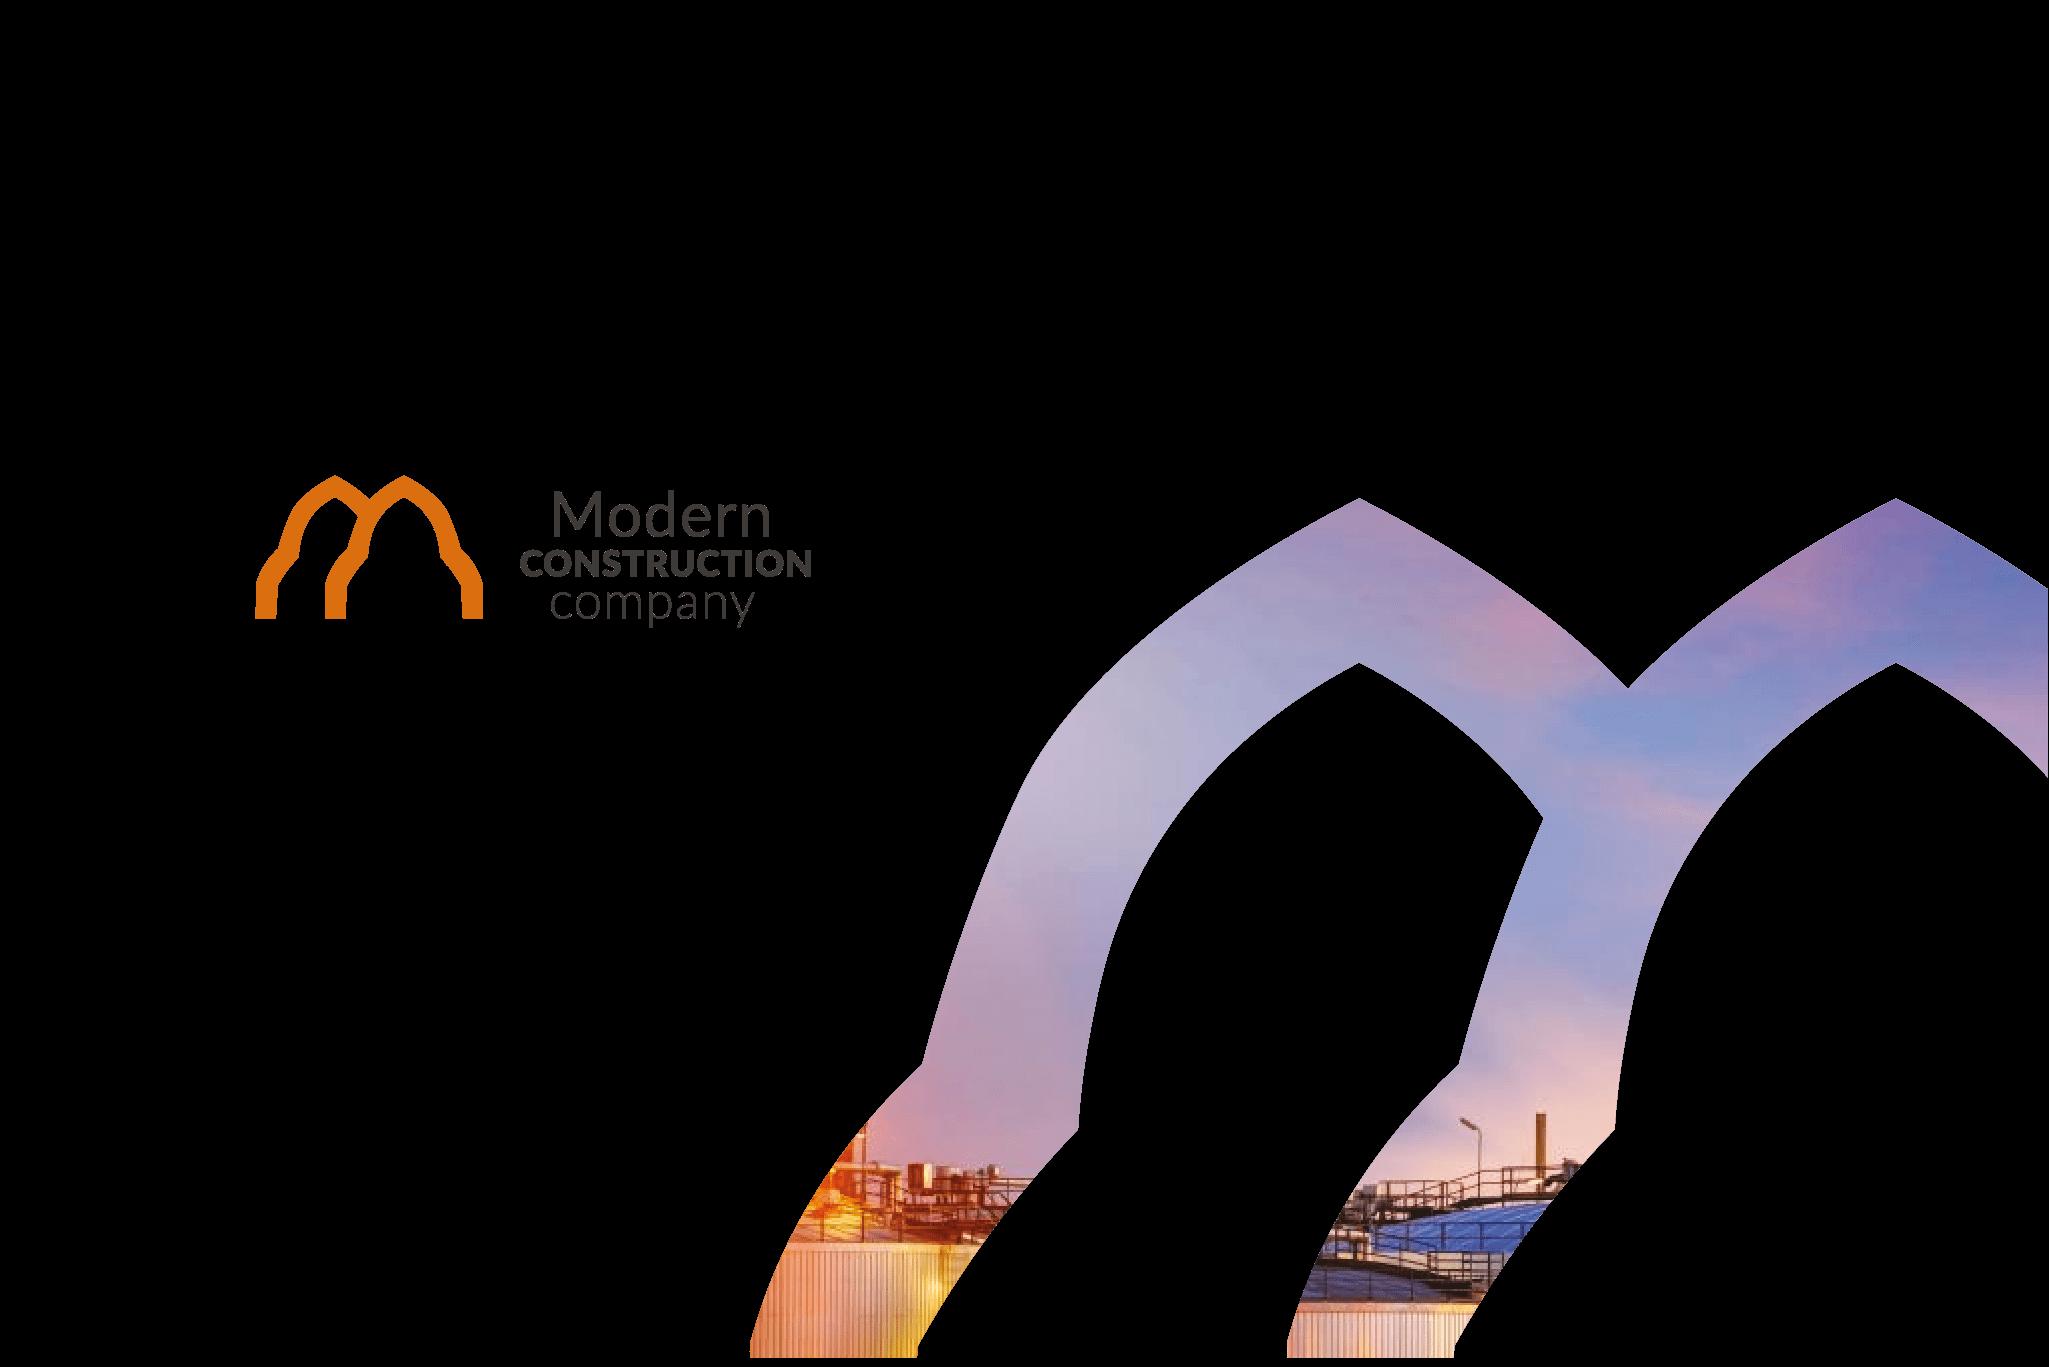 Modern Construction Company